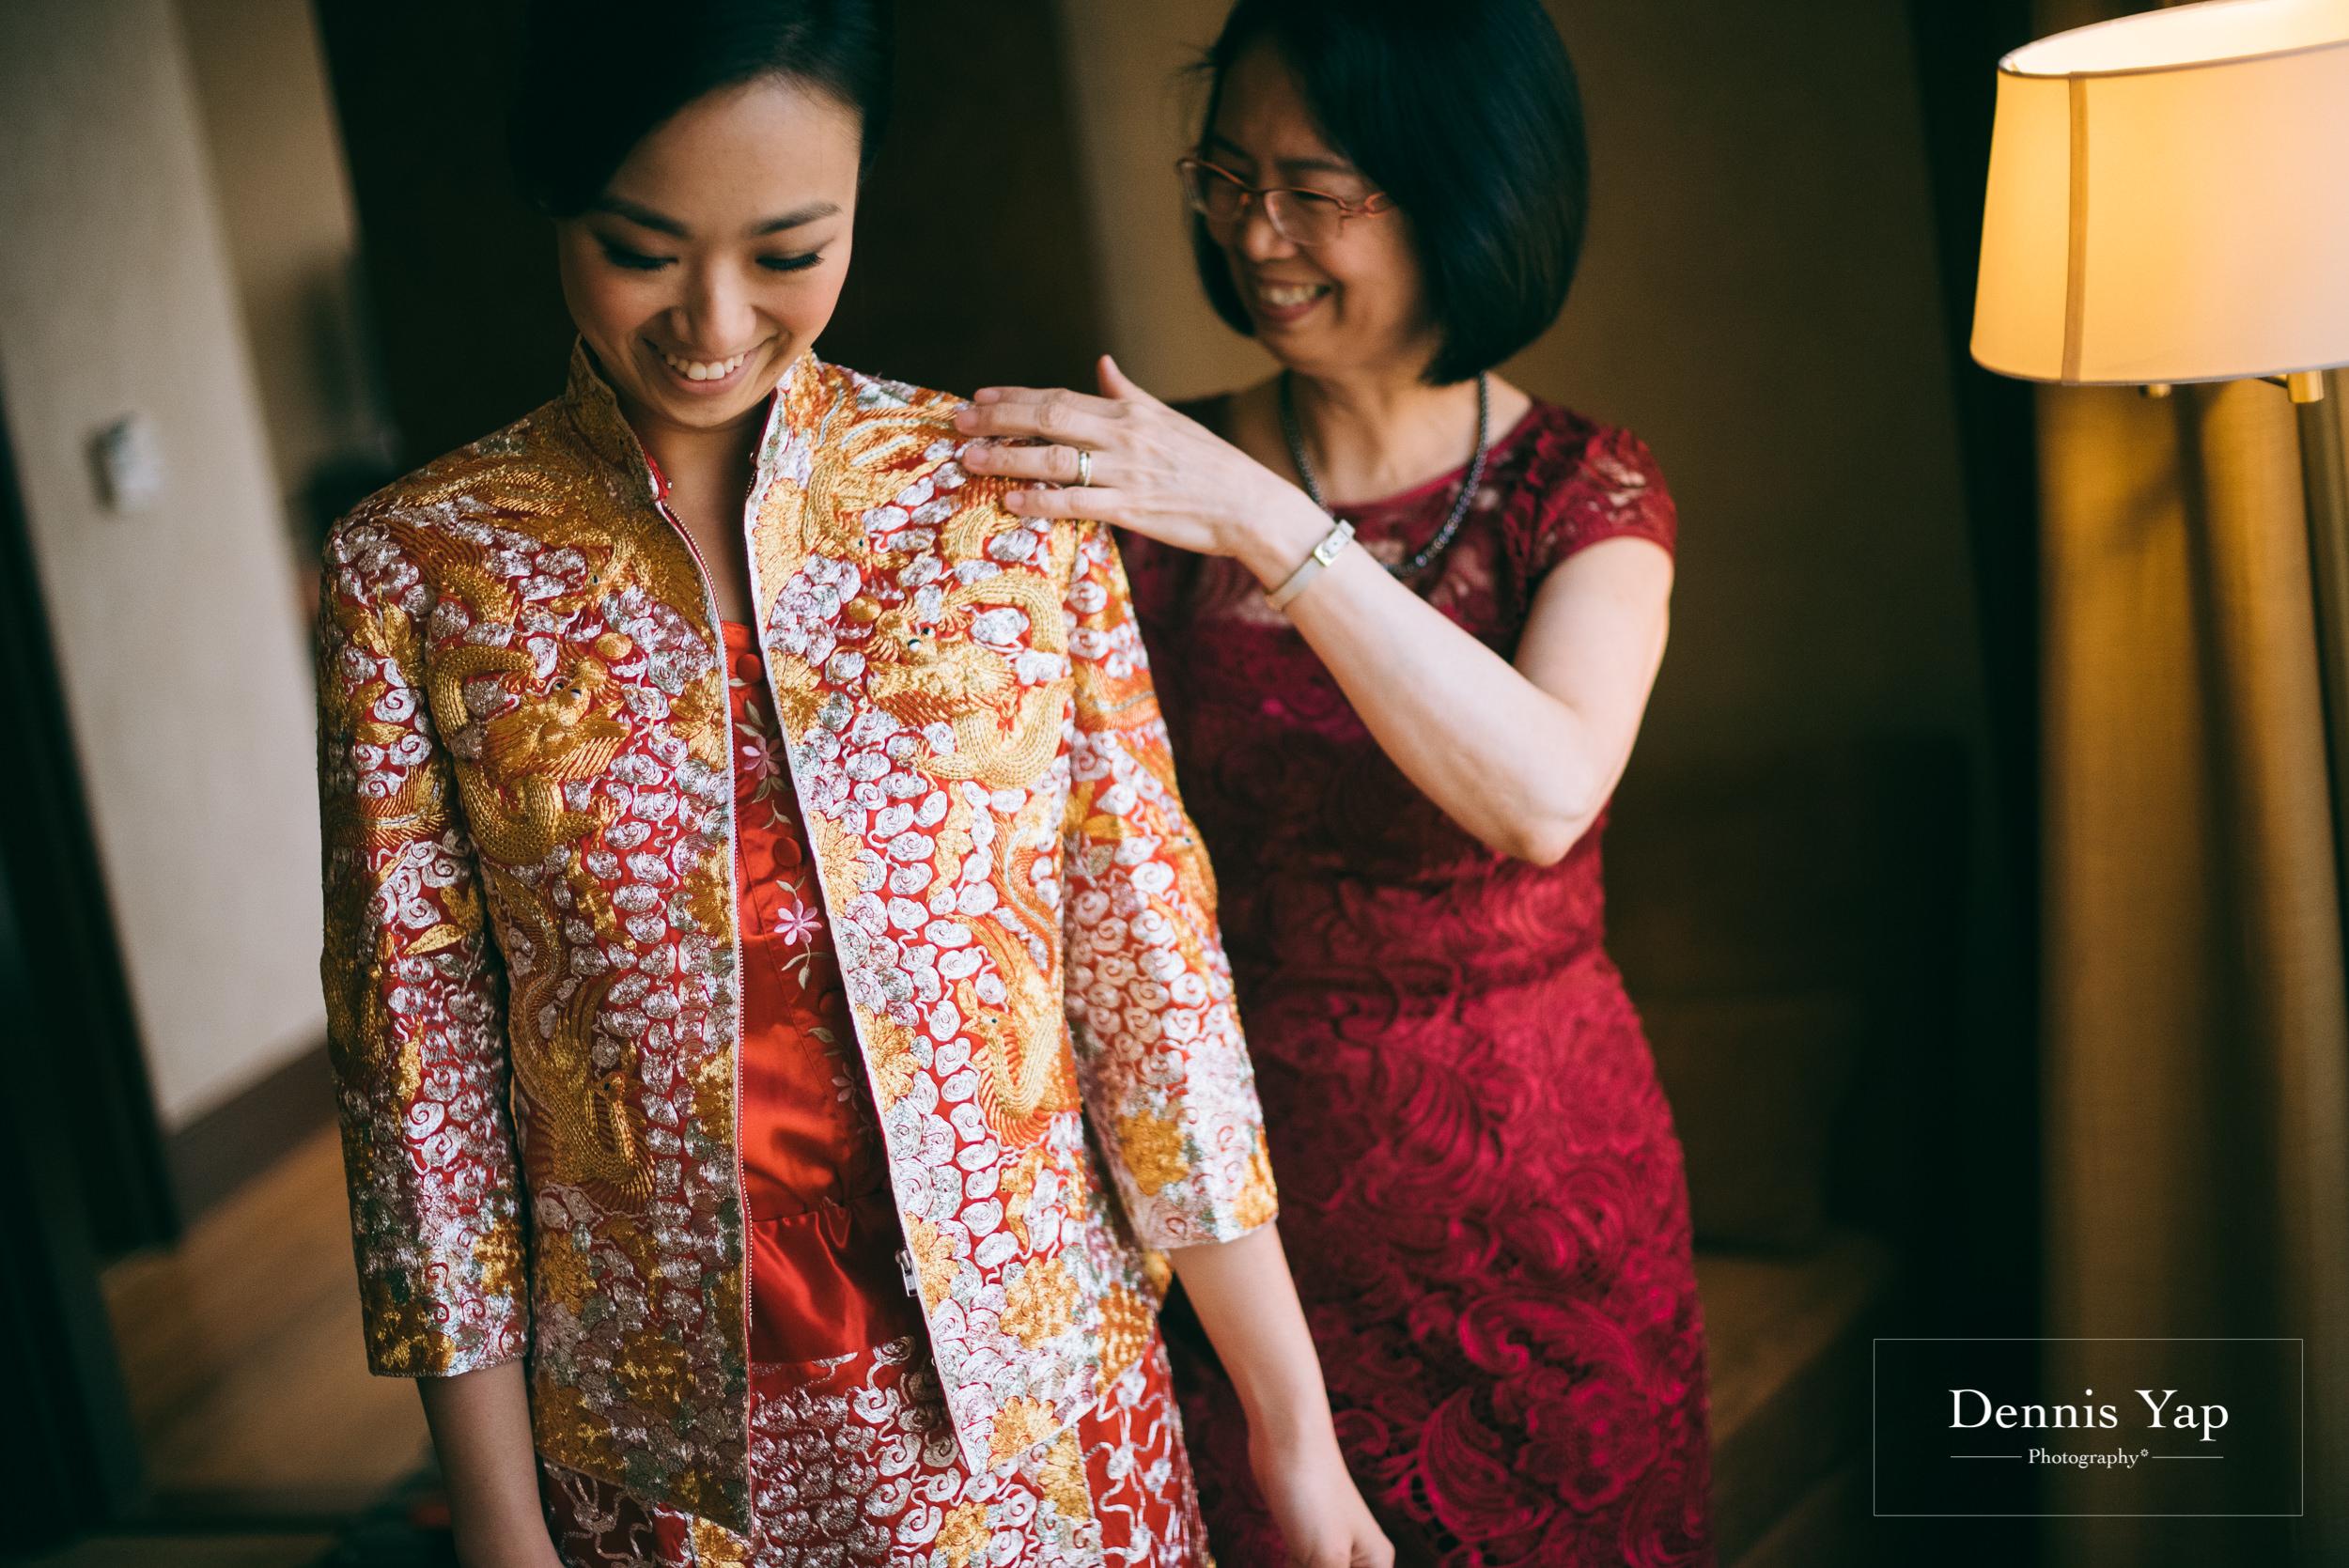 wai keong jenny wedding day bangsar dennis yap photography emotions beloved family-4.jpg